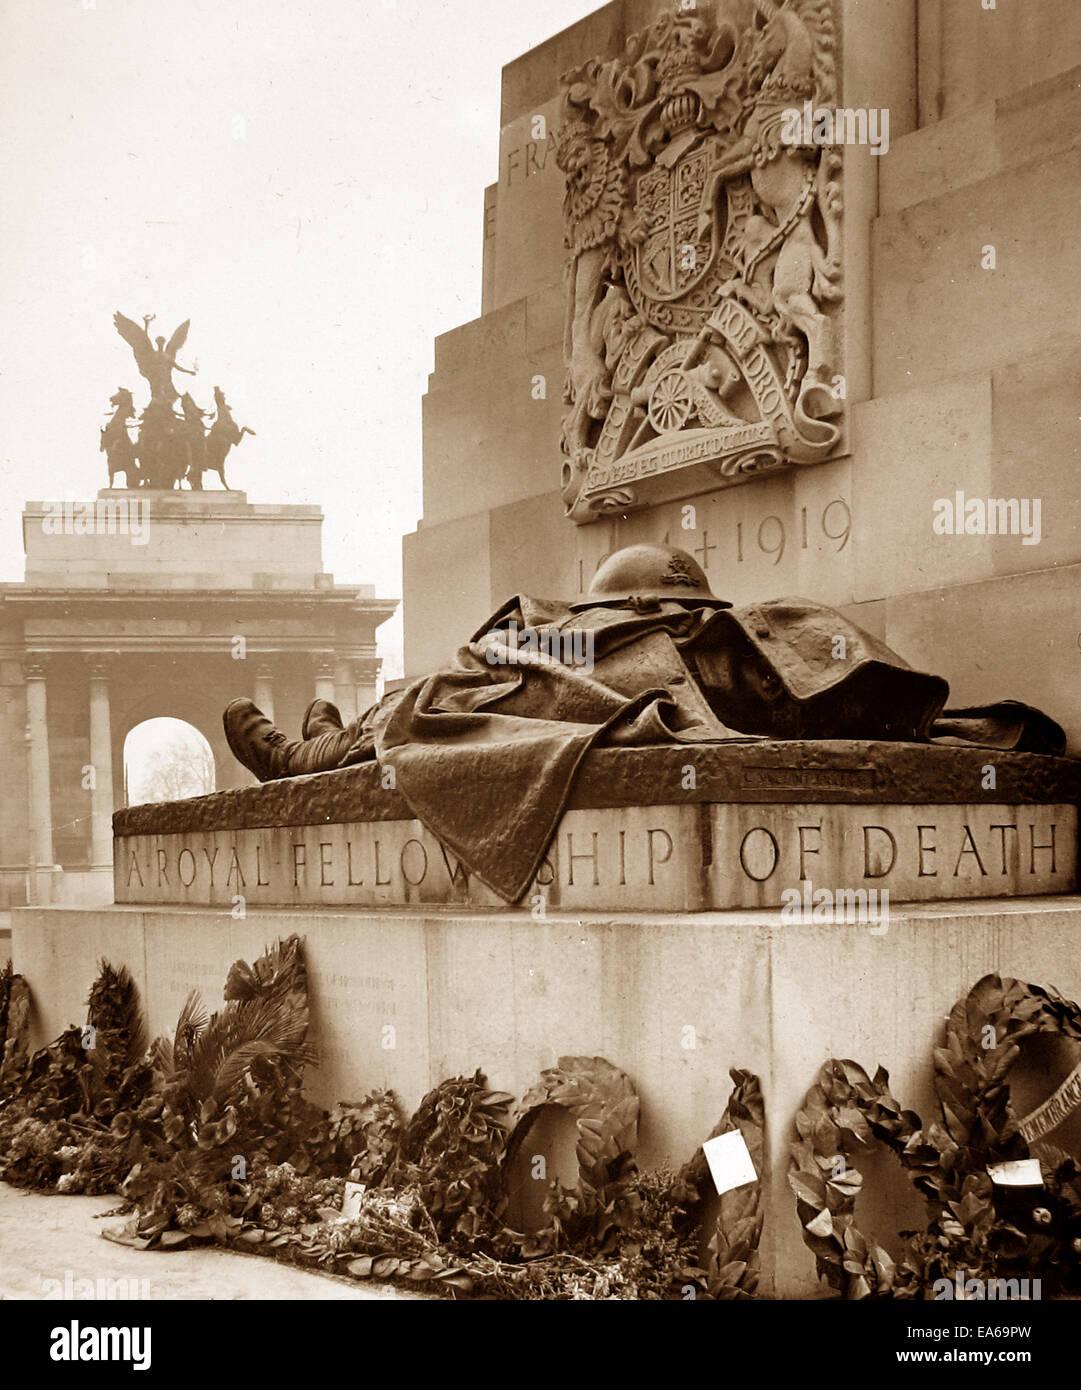 Royal Artillery Memorial Hyde Park London - Stock Image